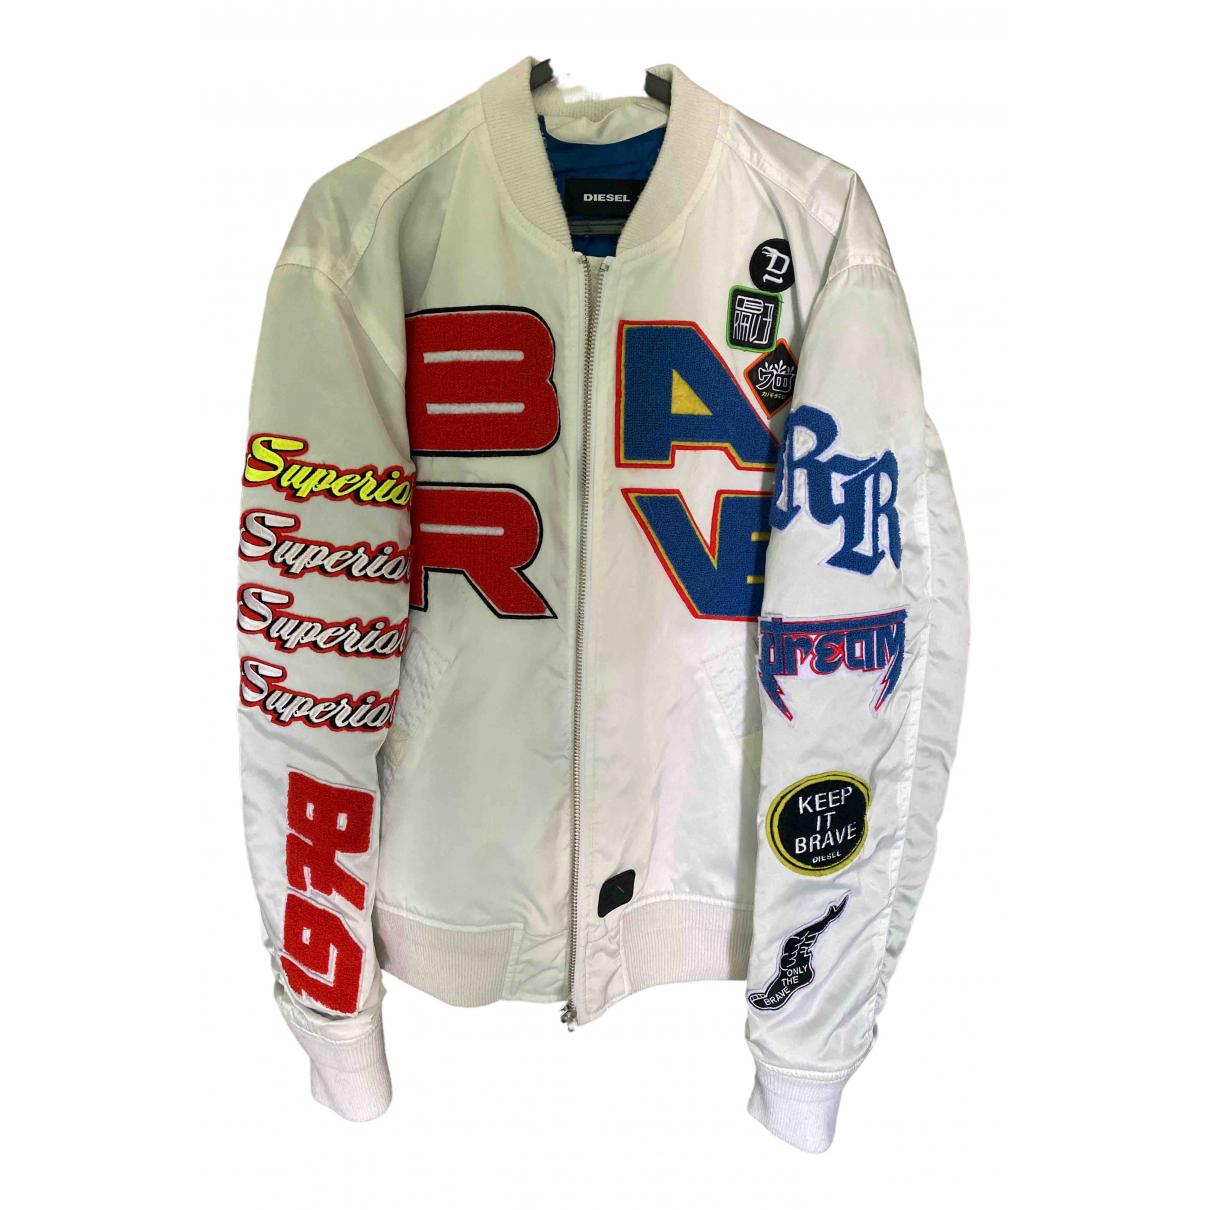 Diesel \N White jacket  for Men L International